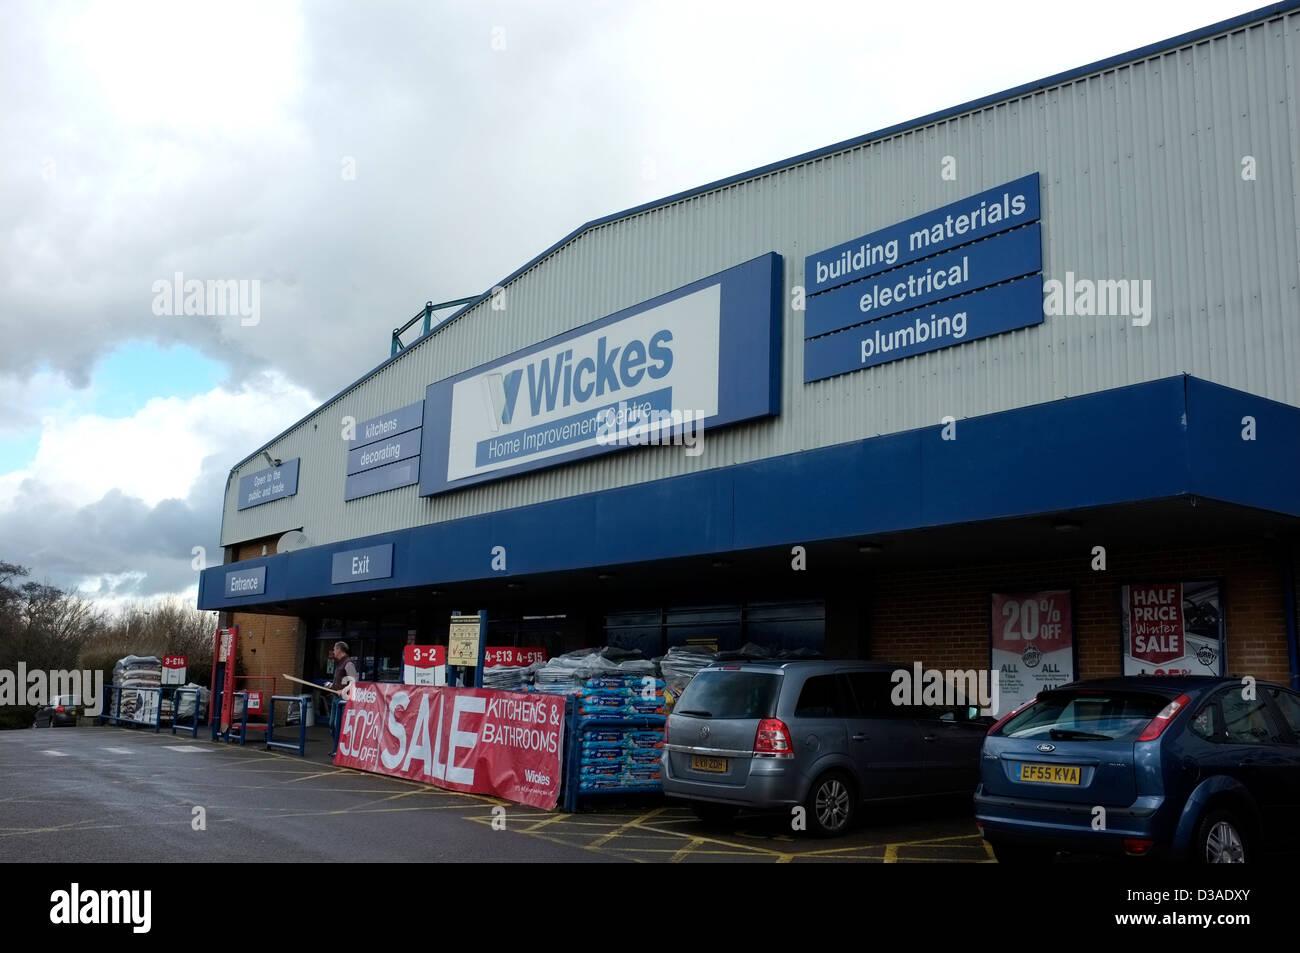 wickes diy store sevenoaks kent uk 2013 Stock Photo: 53705539 - Alamy